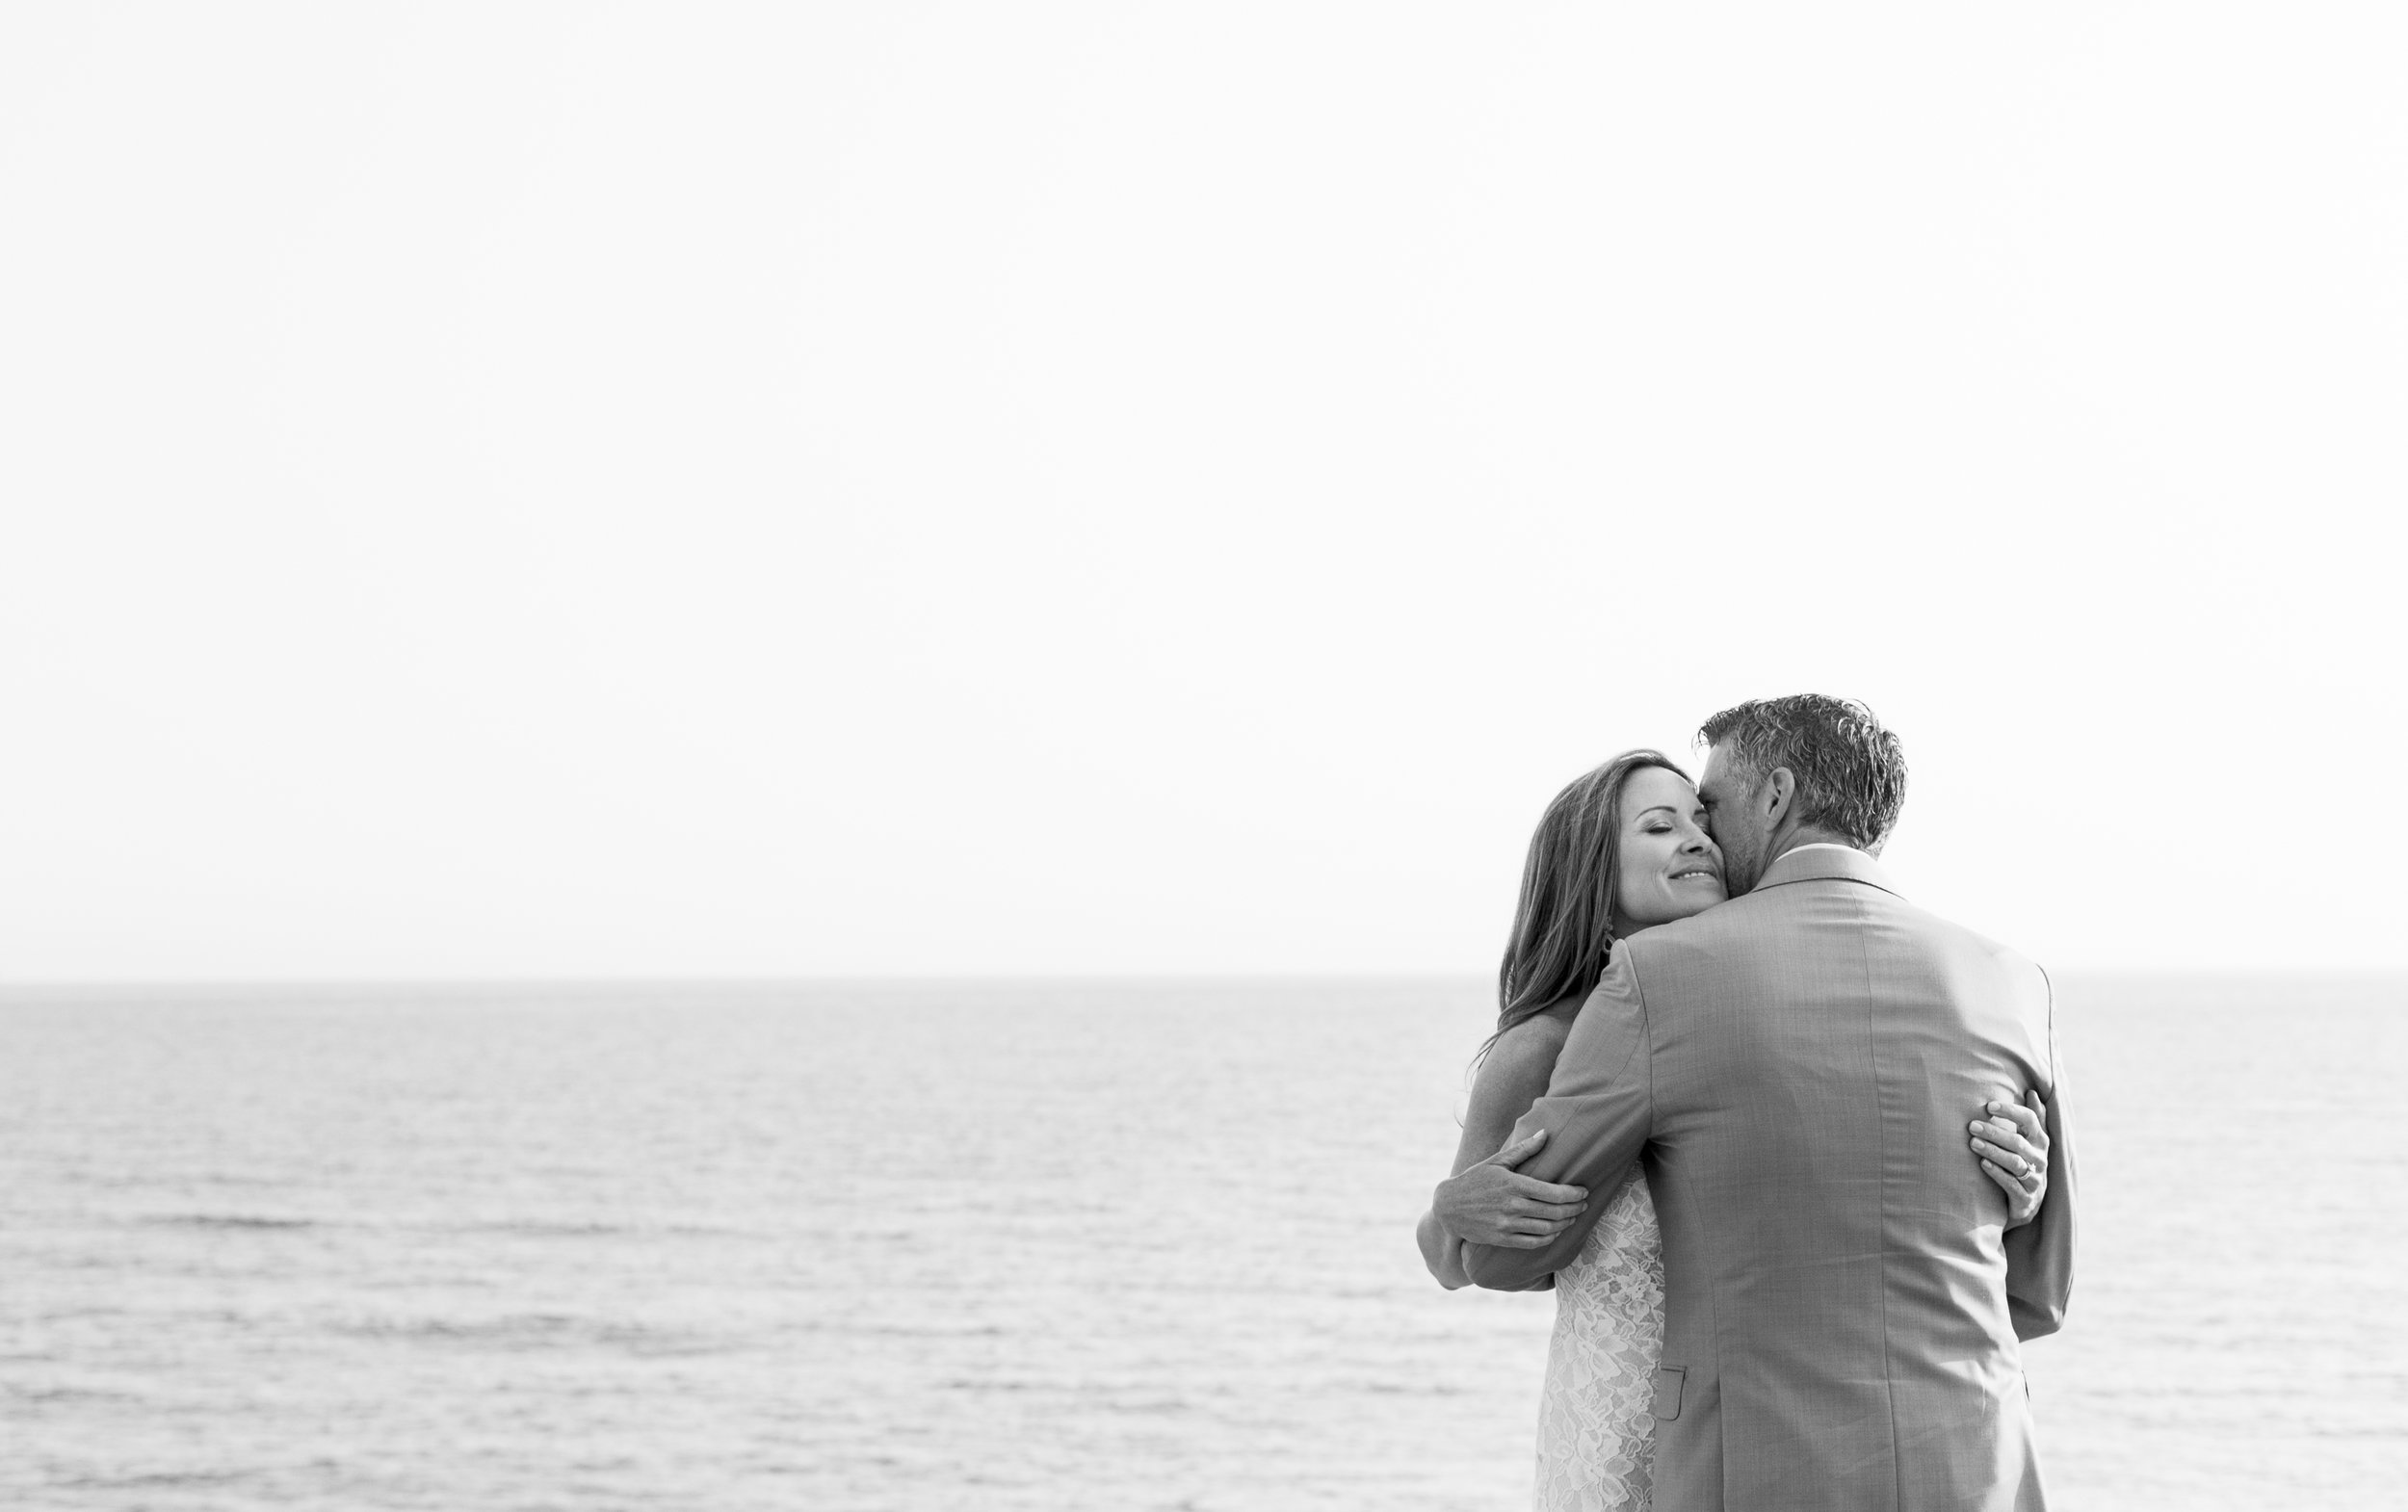 santa-barbara-elopement-elope-wedding-planner-coordinator-coordination-day-of-intimate-rustic-ellwood-bluffs-forest-beach-ocean-view-green-white-event (8).jpg